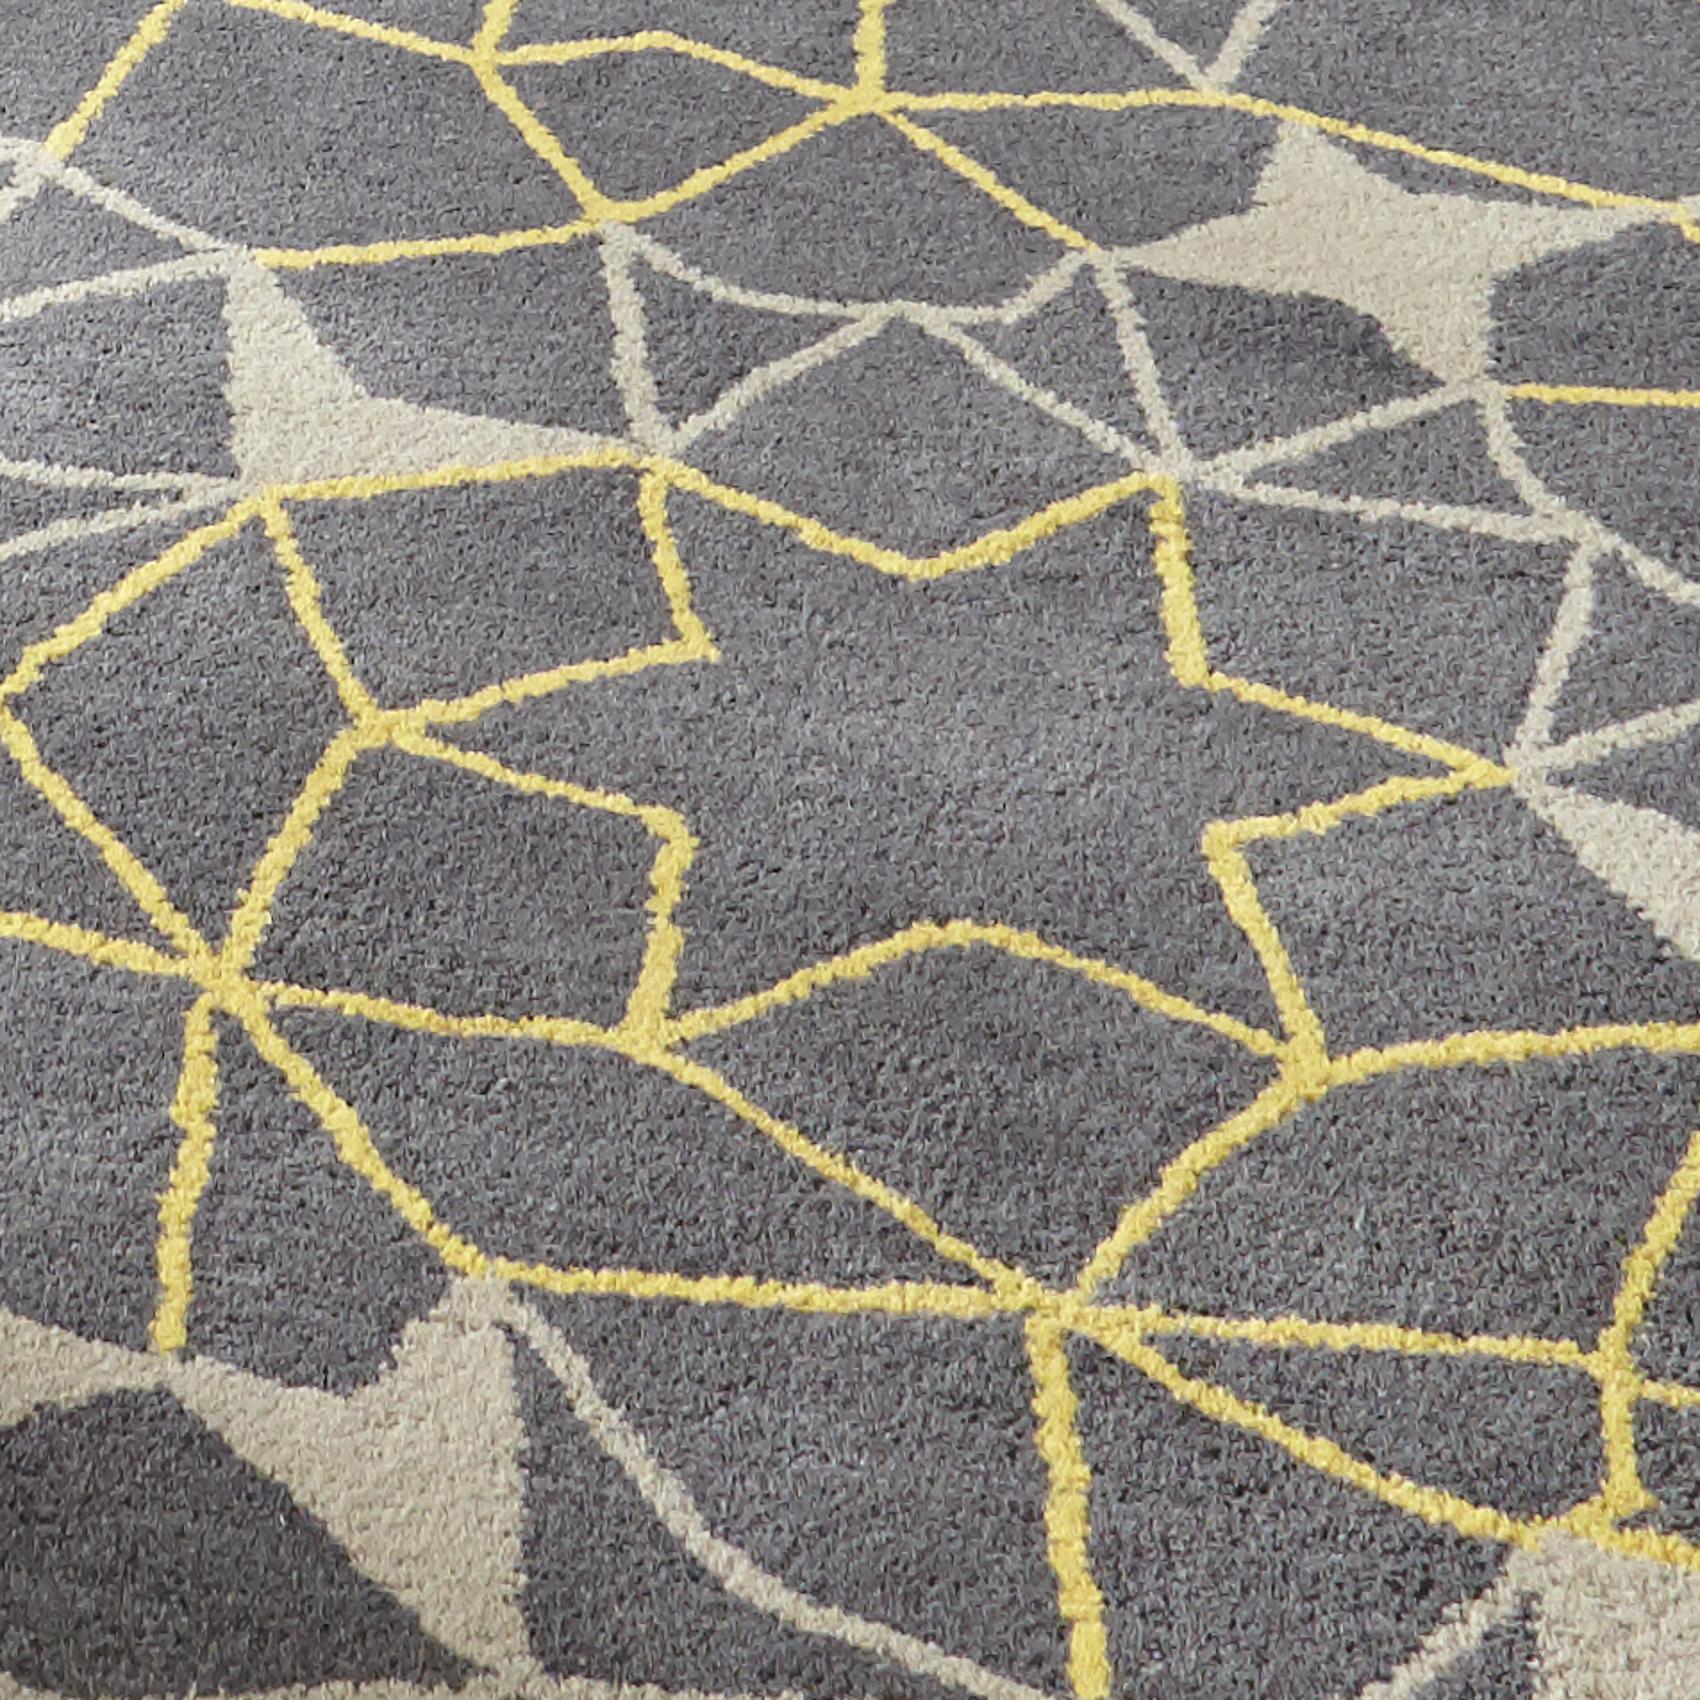 Spectrum Hand Tufted Arrows Stars Rug 100% Wool Modern